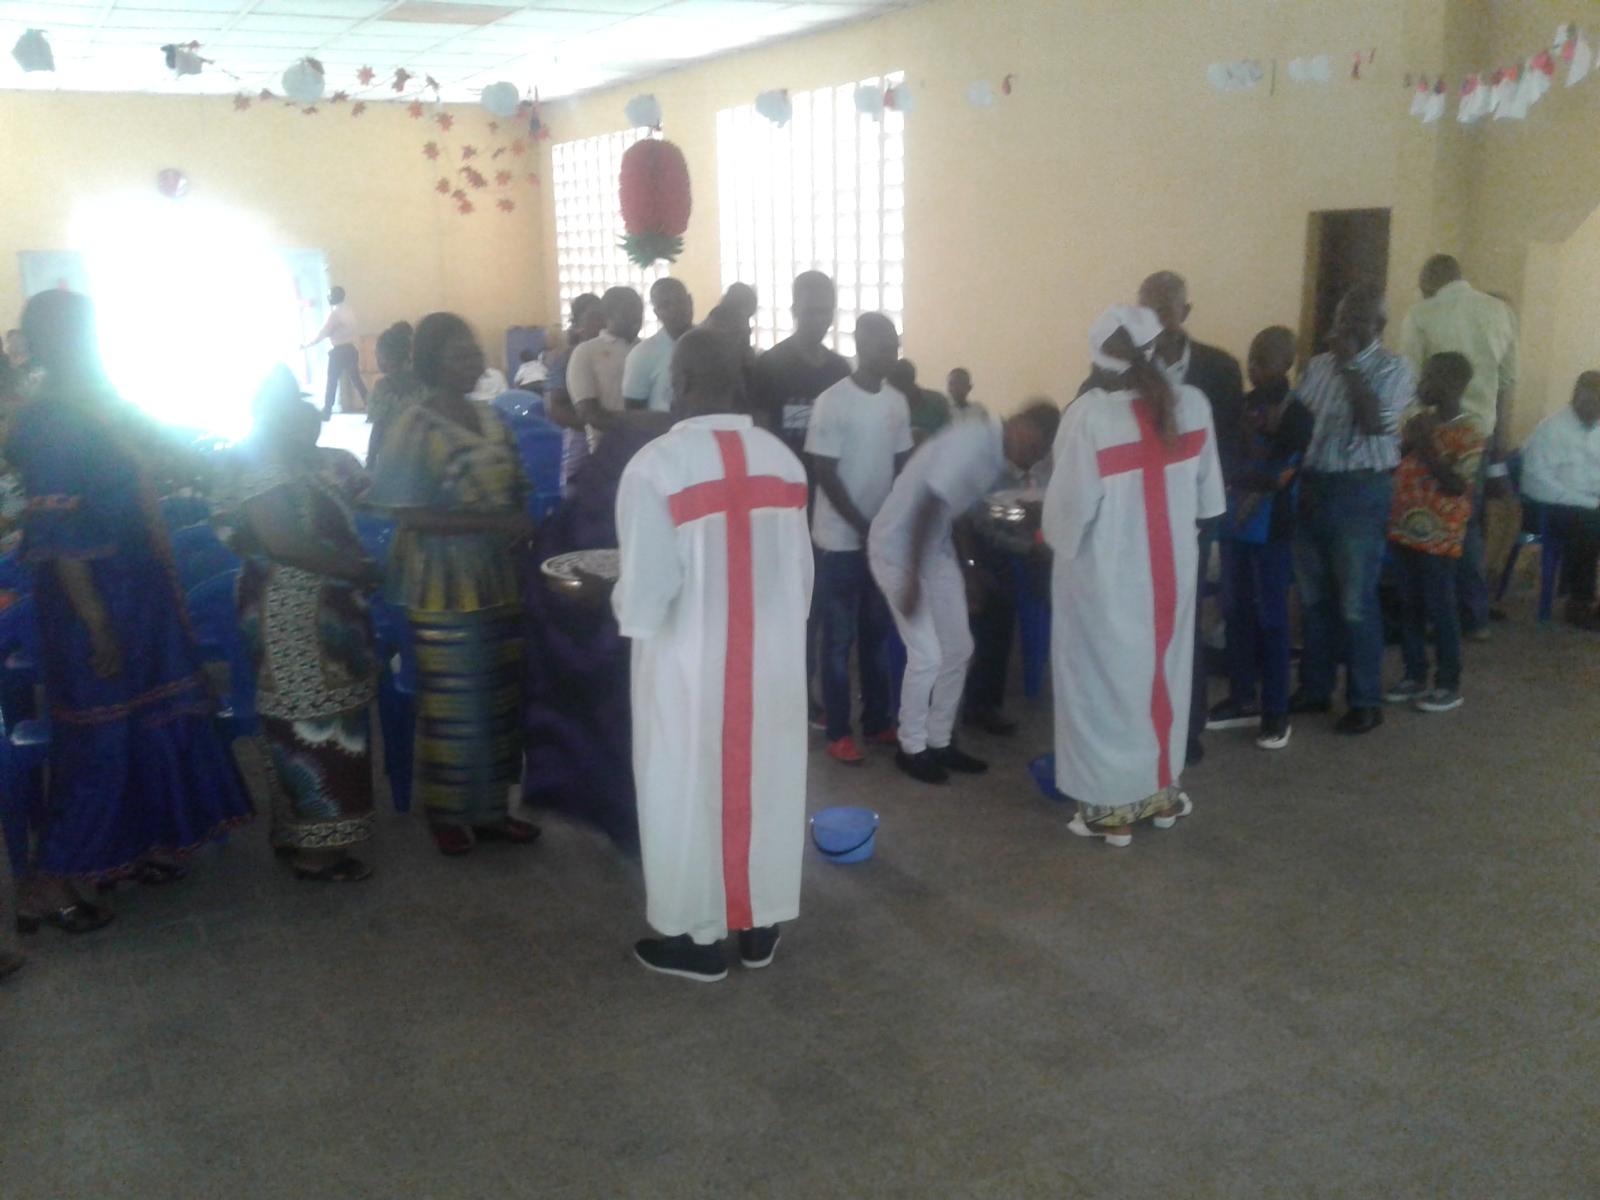 DR_Congo_Paul_Turner_20180617_104534.jpeg